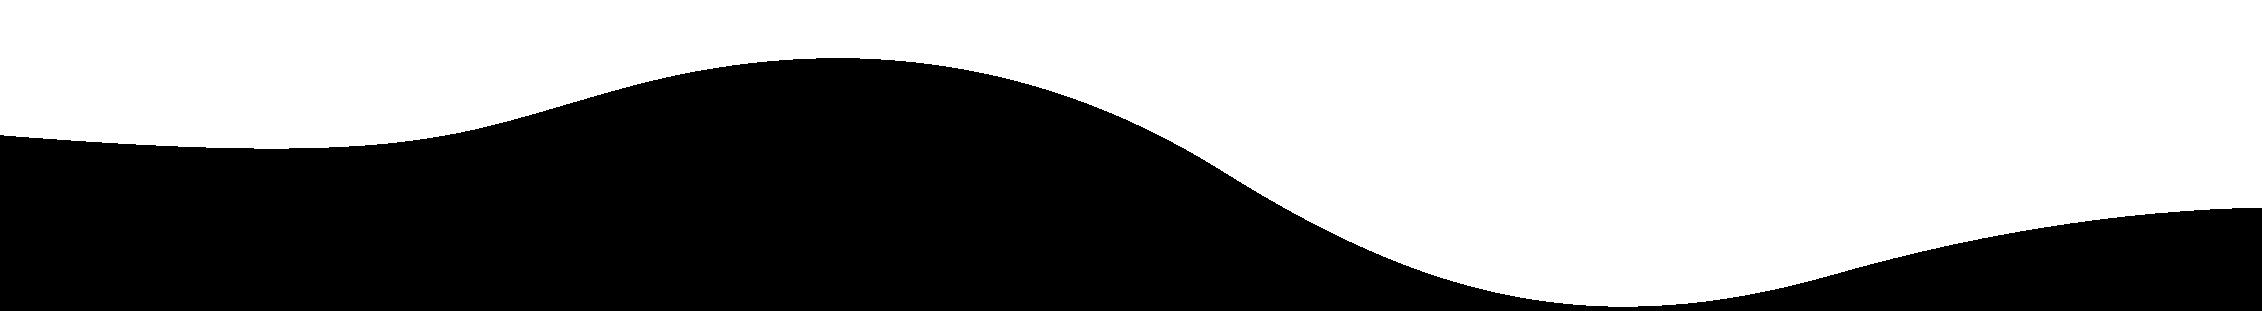 hosting-company-02